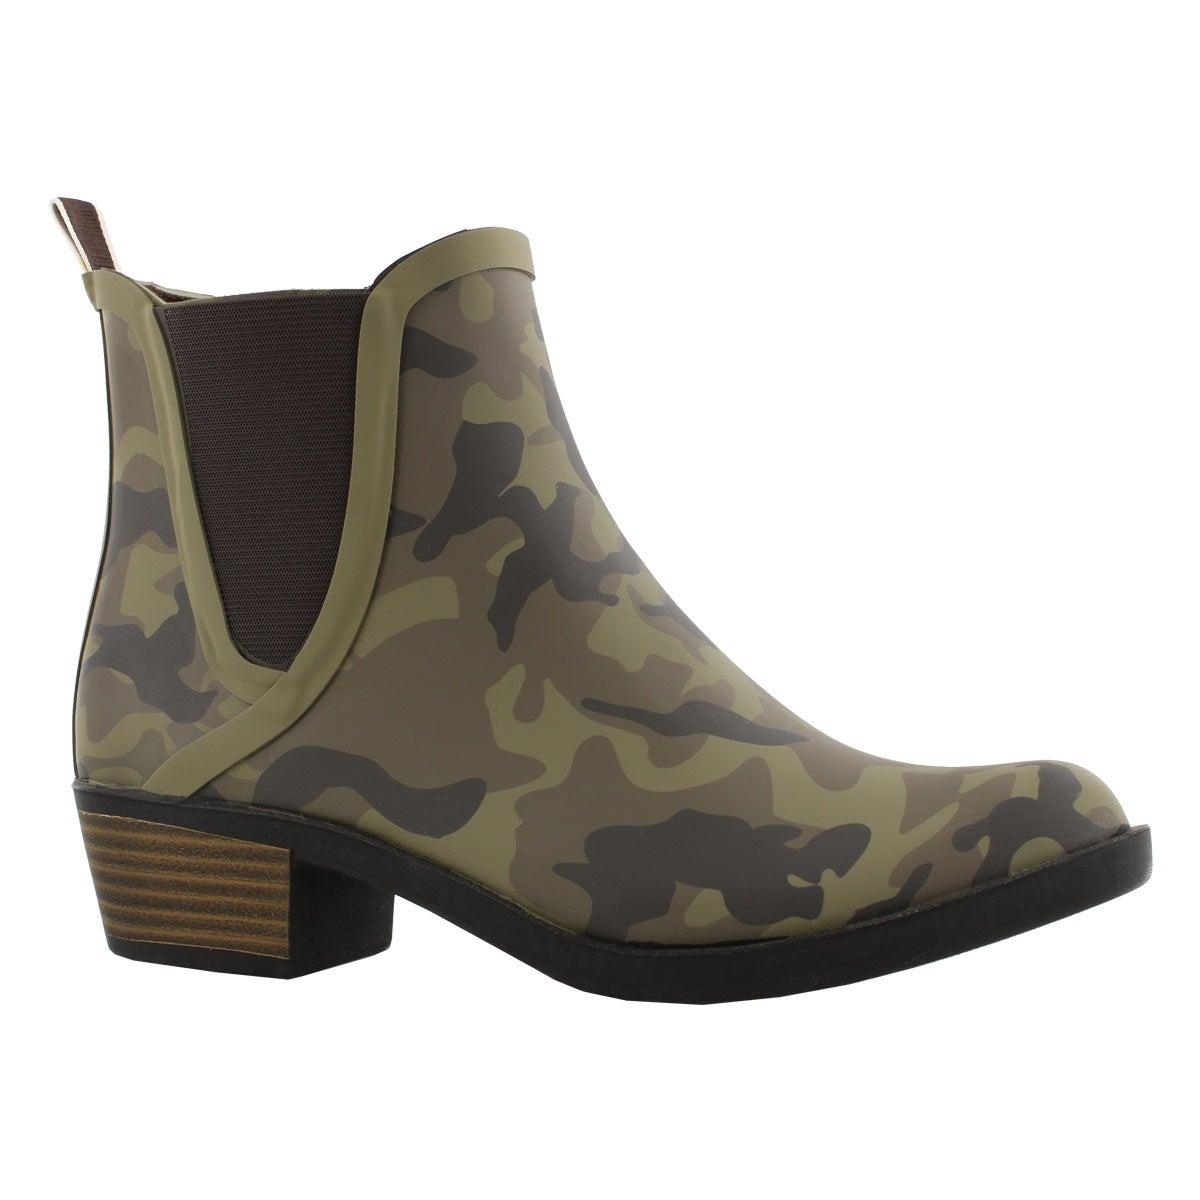 Lds Basel H20 camo chelsea rain boot